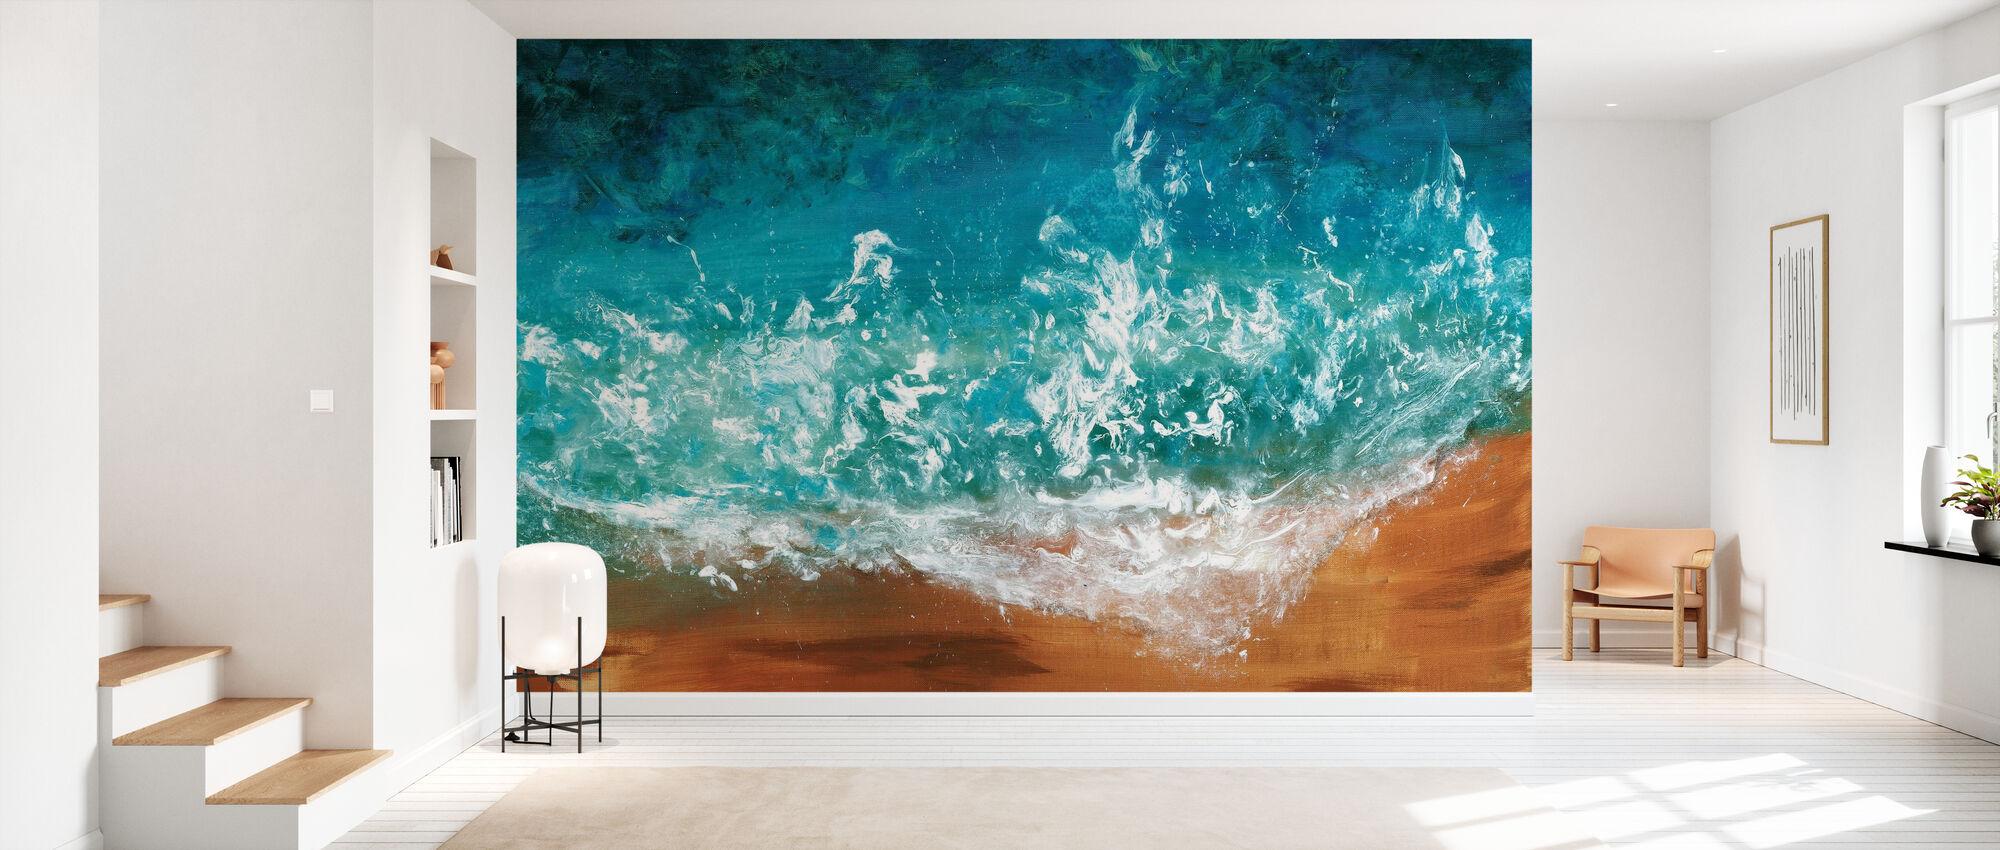 Homecoming - Wallpaper - Hallway